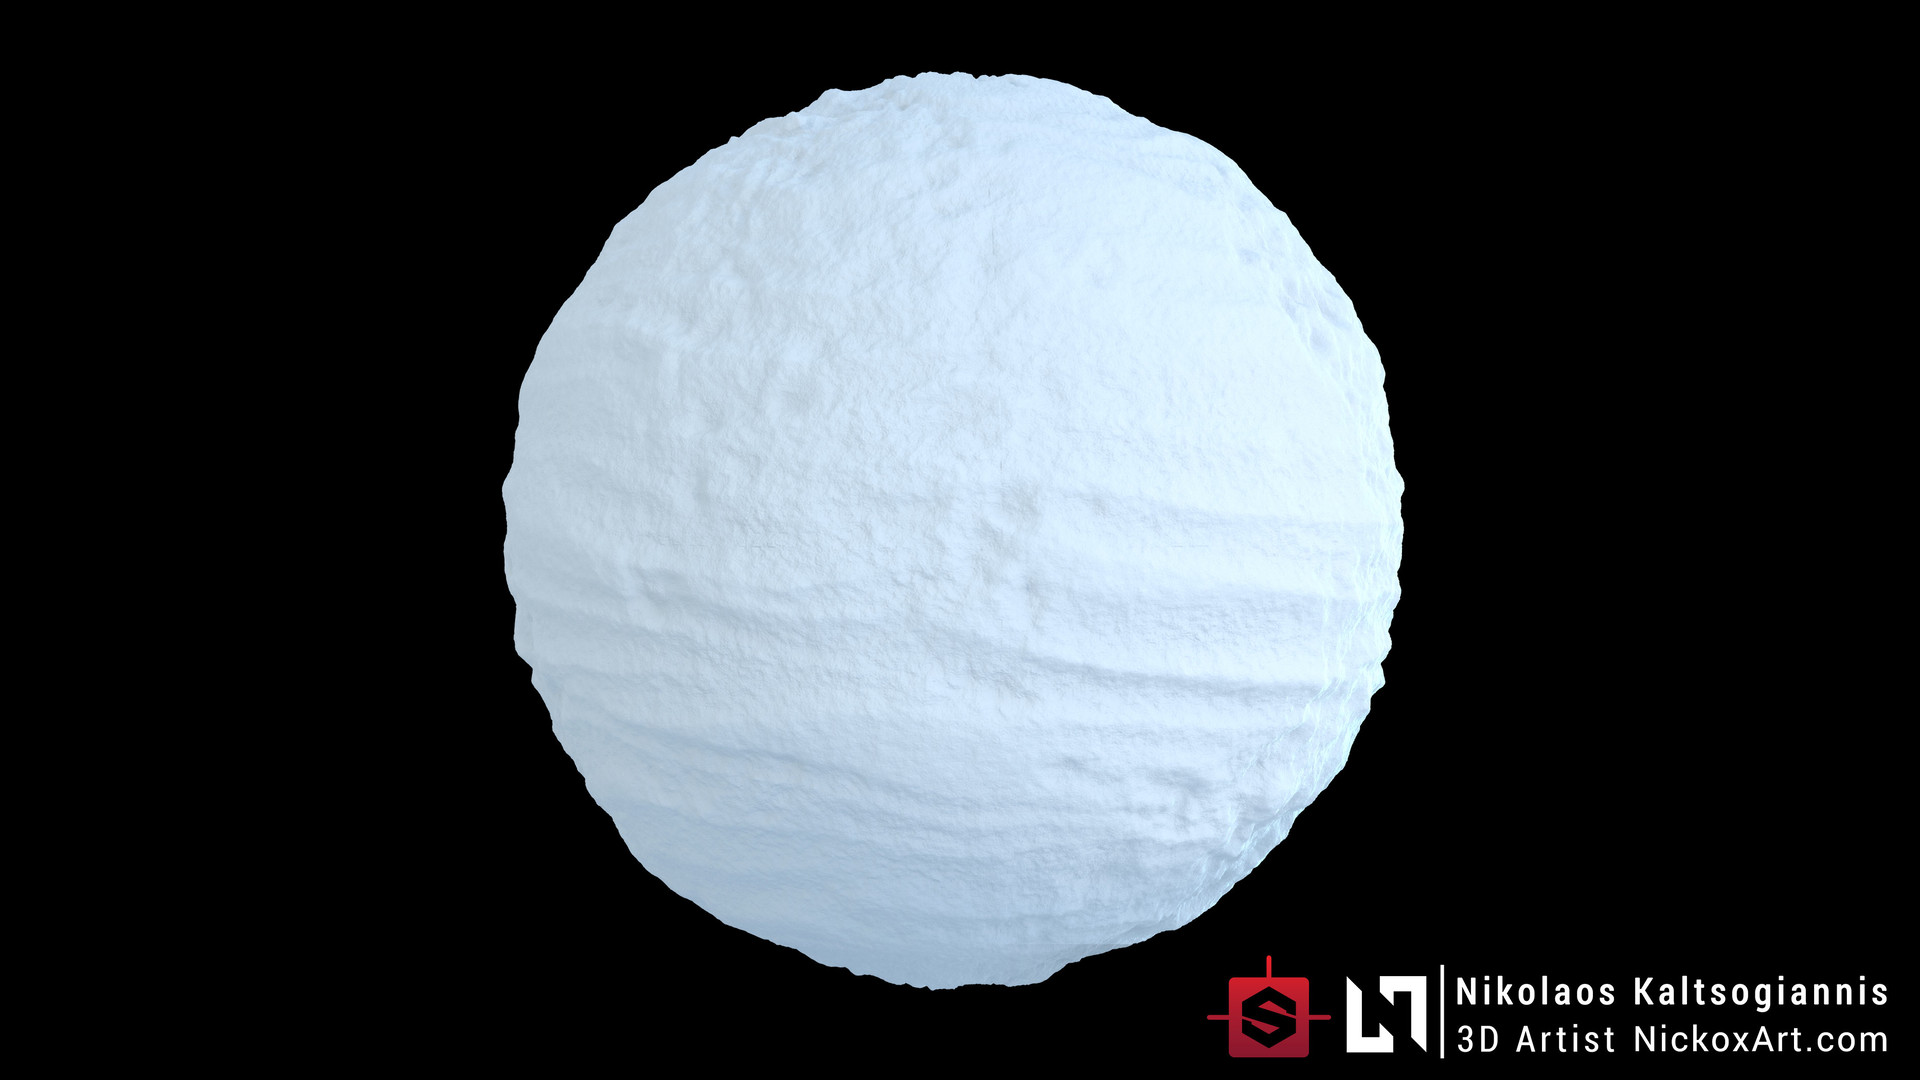 Nikolaos kaltsogiannis snow material 02